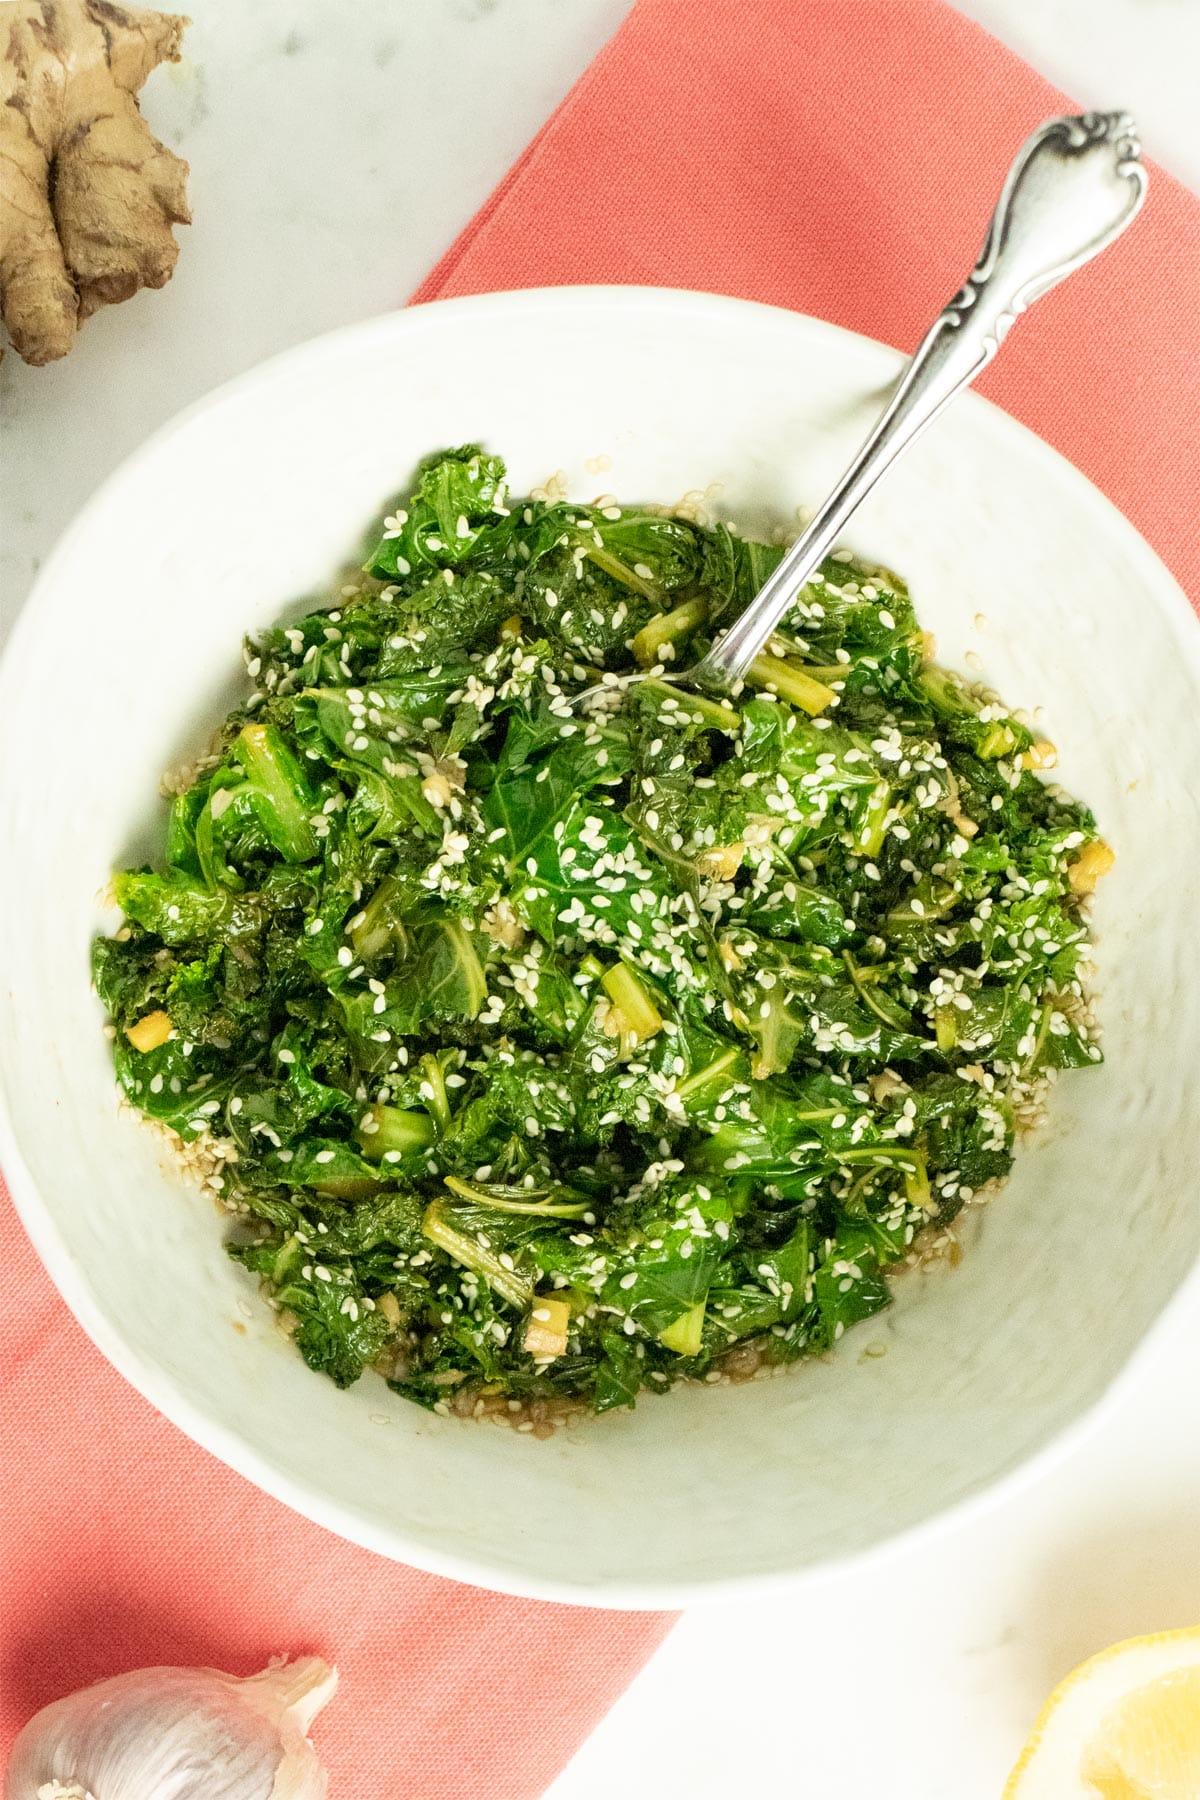 finished bowl of ginger-sesame kale stir fry on the table